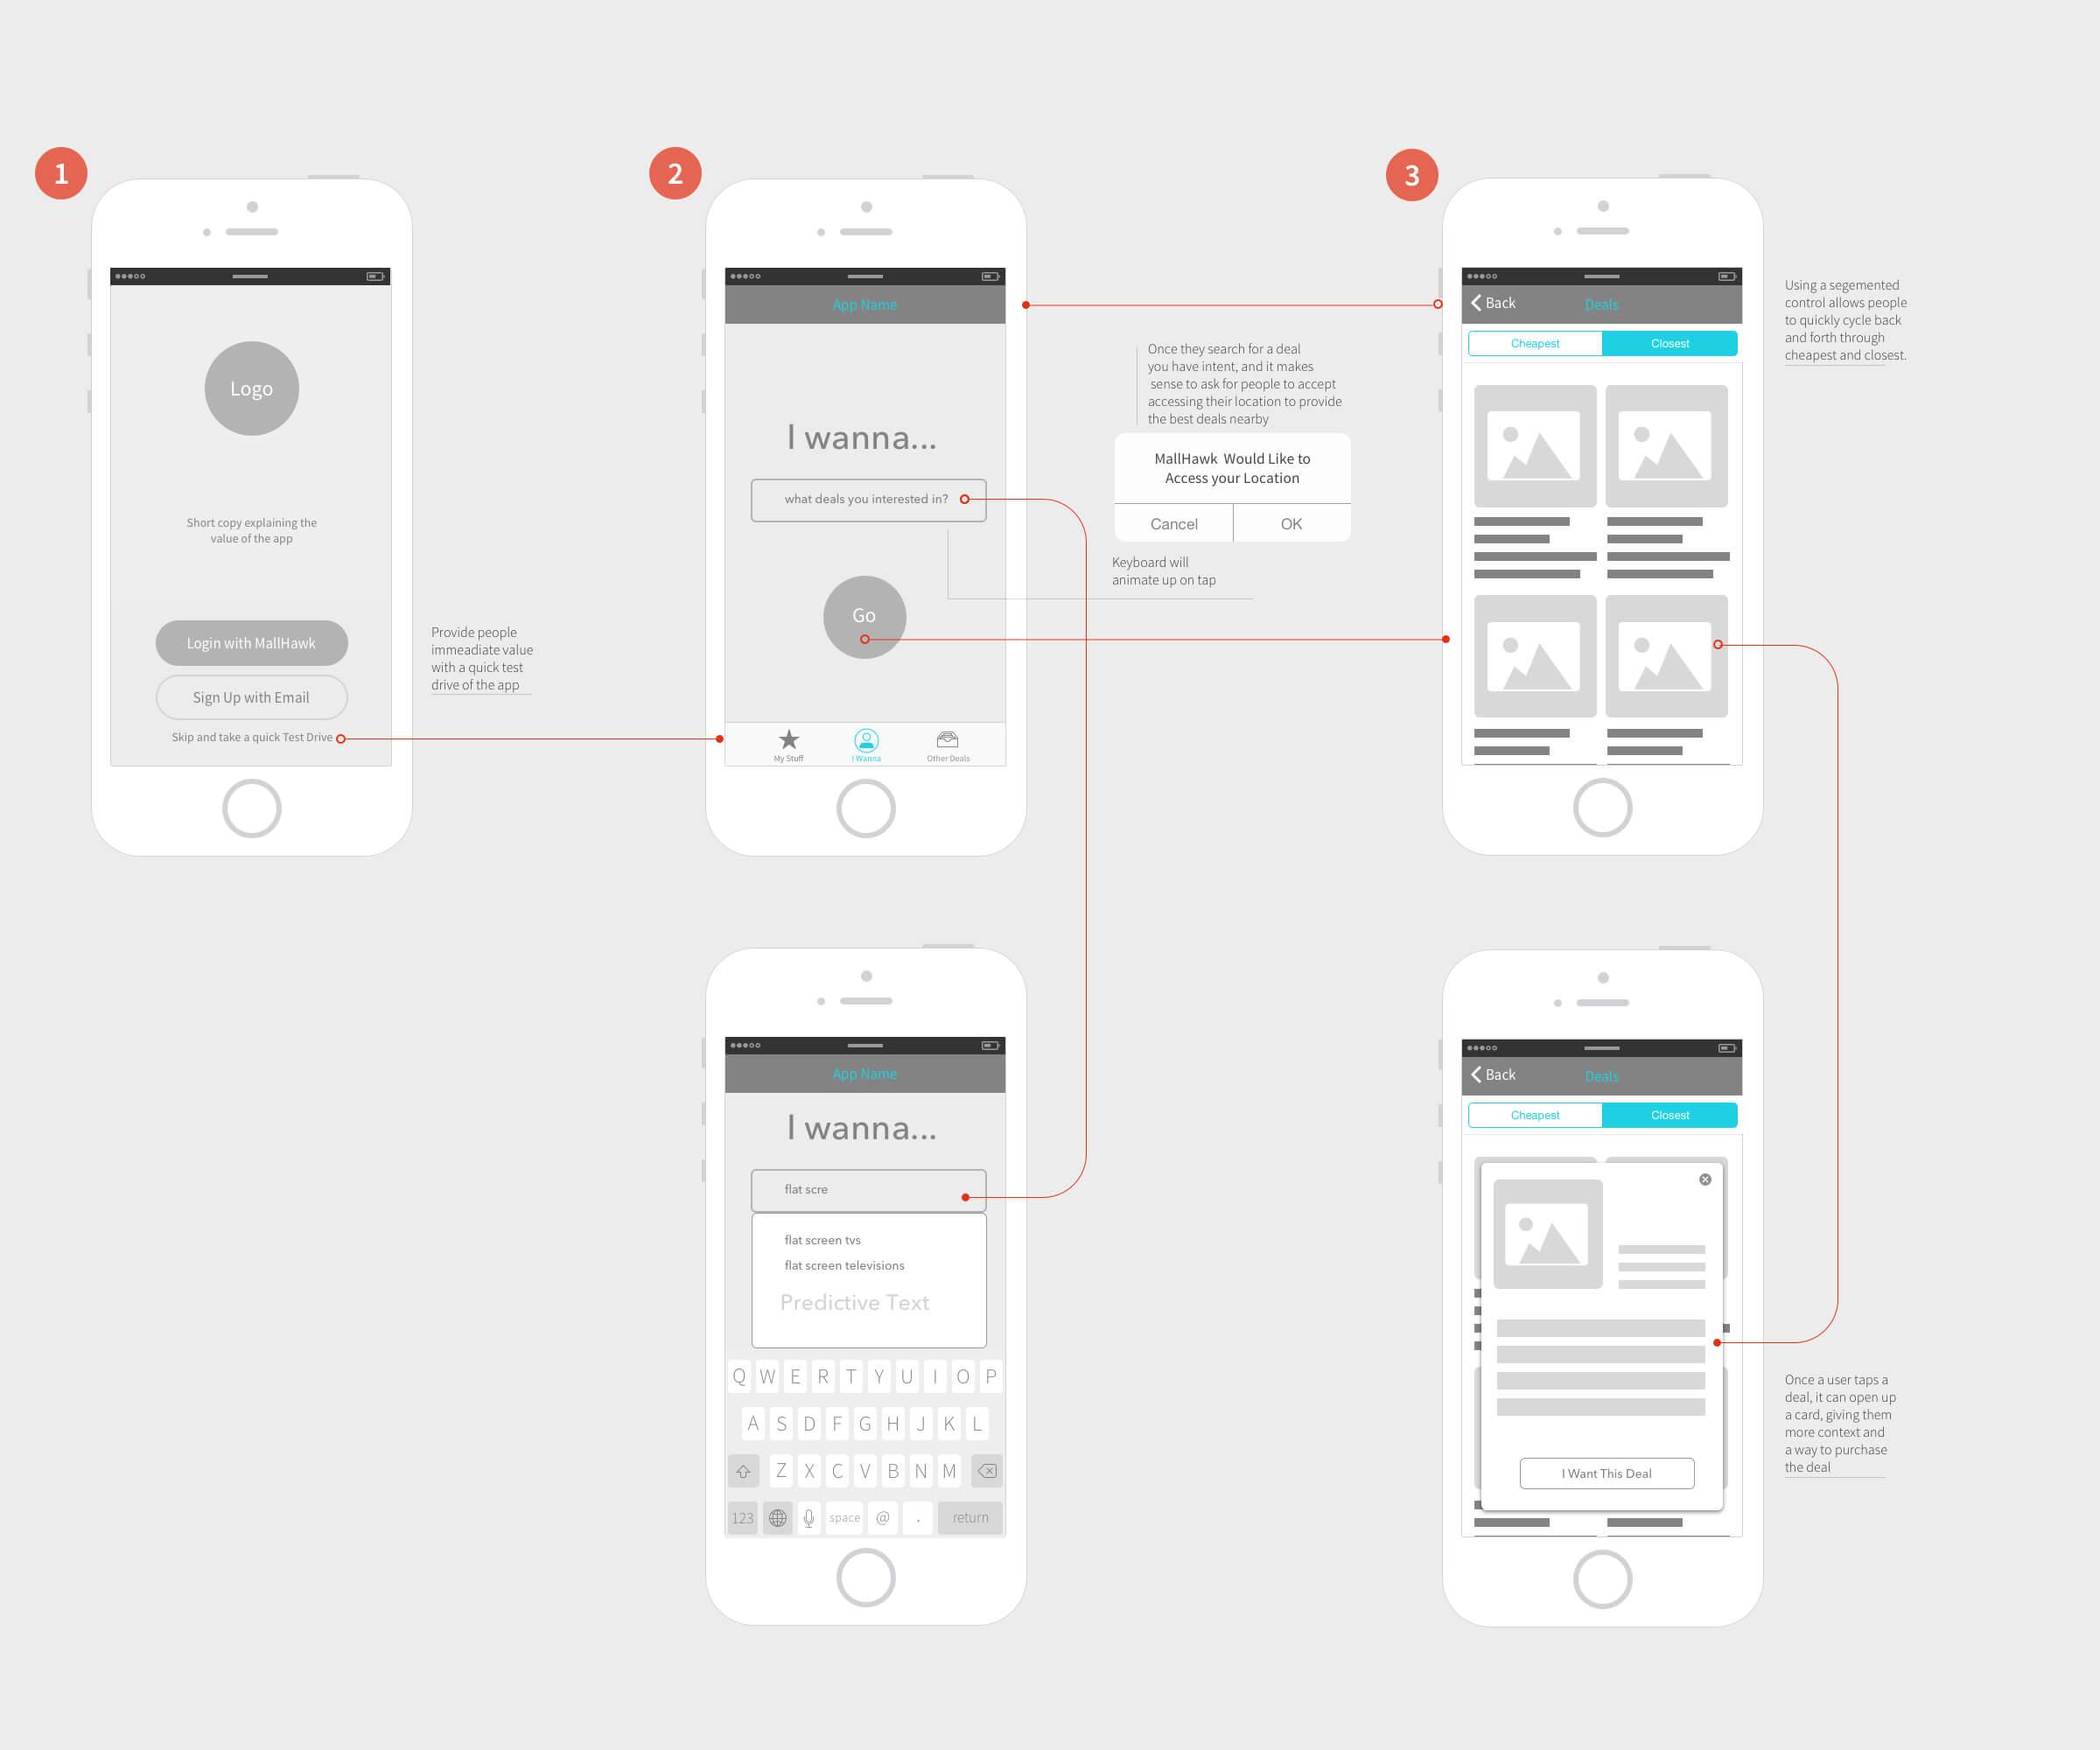 Early flow of iOS app